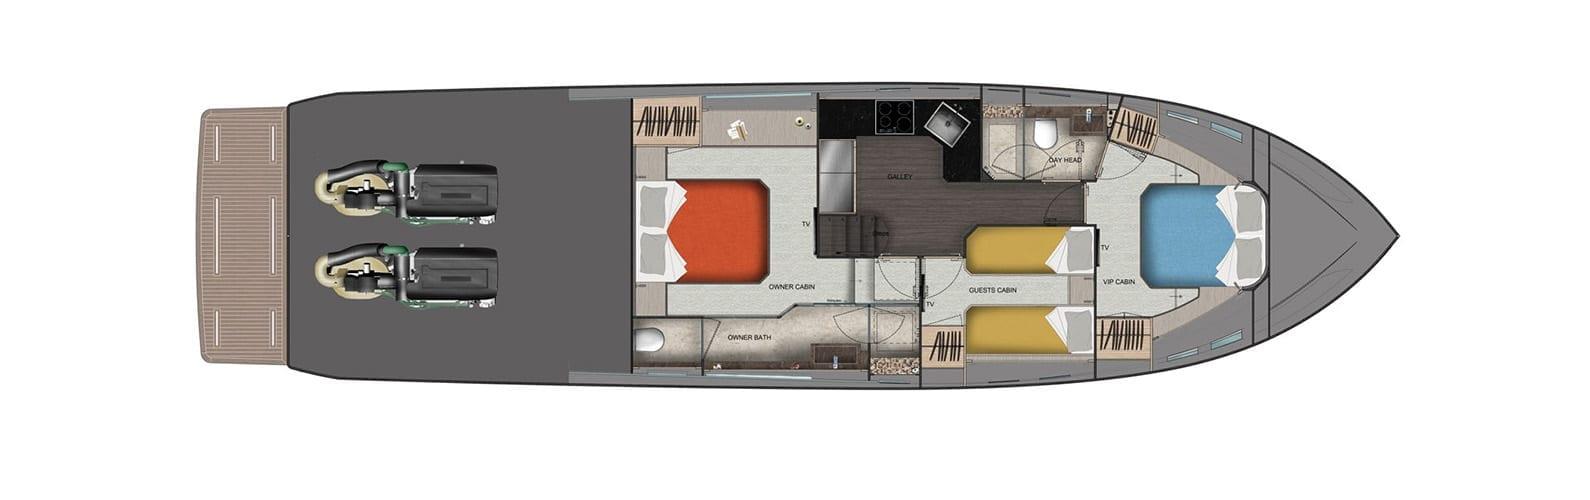 uniesse-ss-6-floor 3